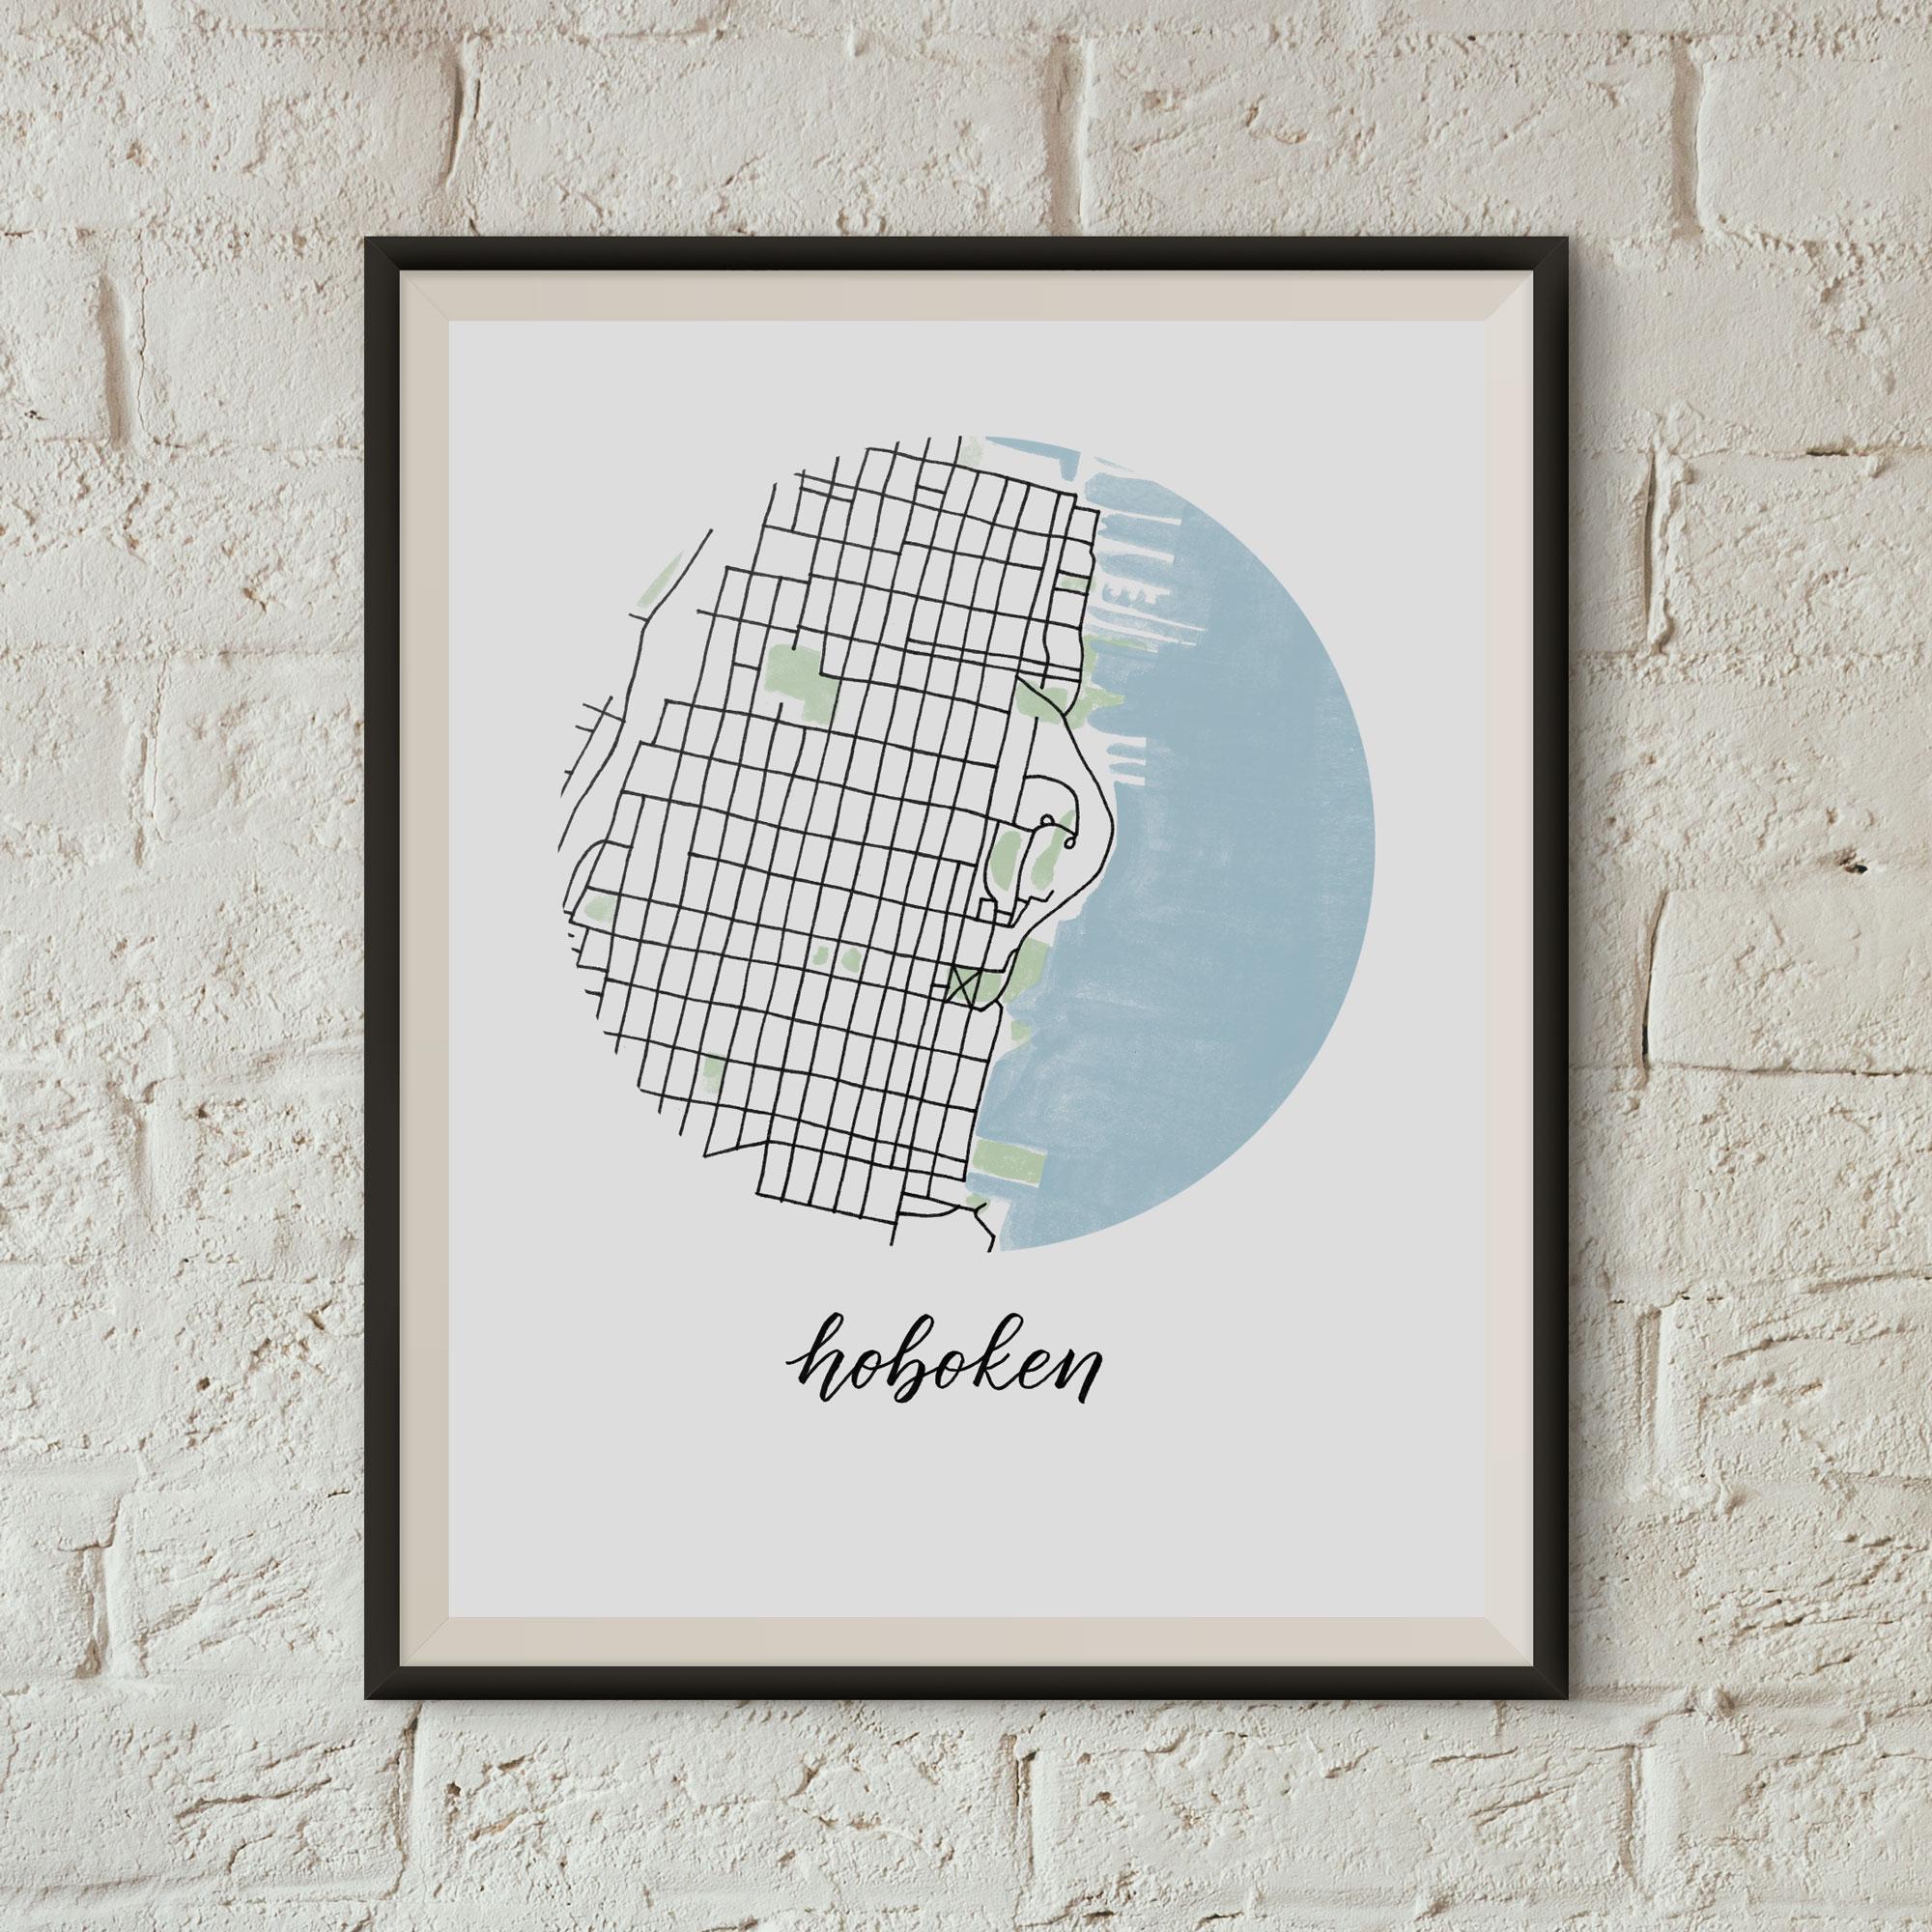 Hoboken Map Print framed on a white brick wall